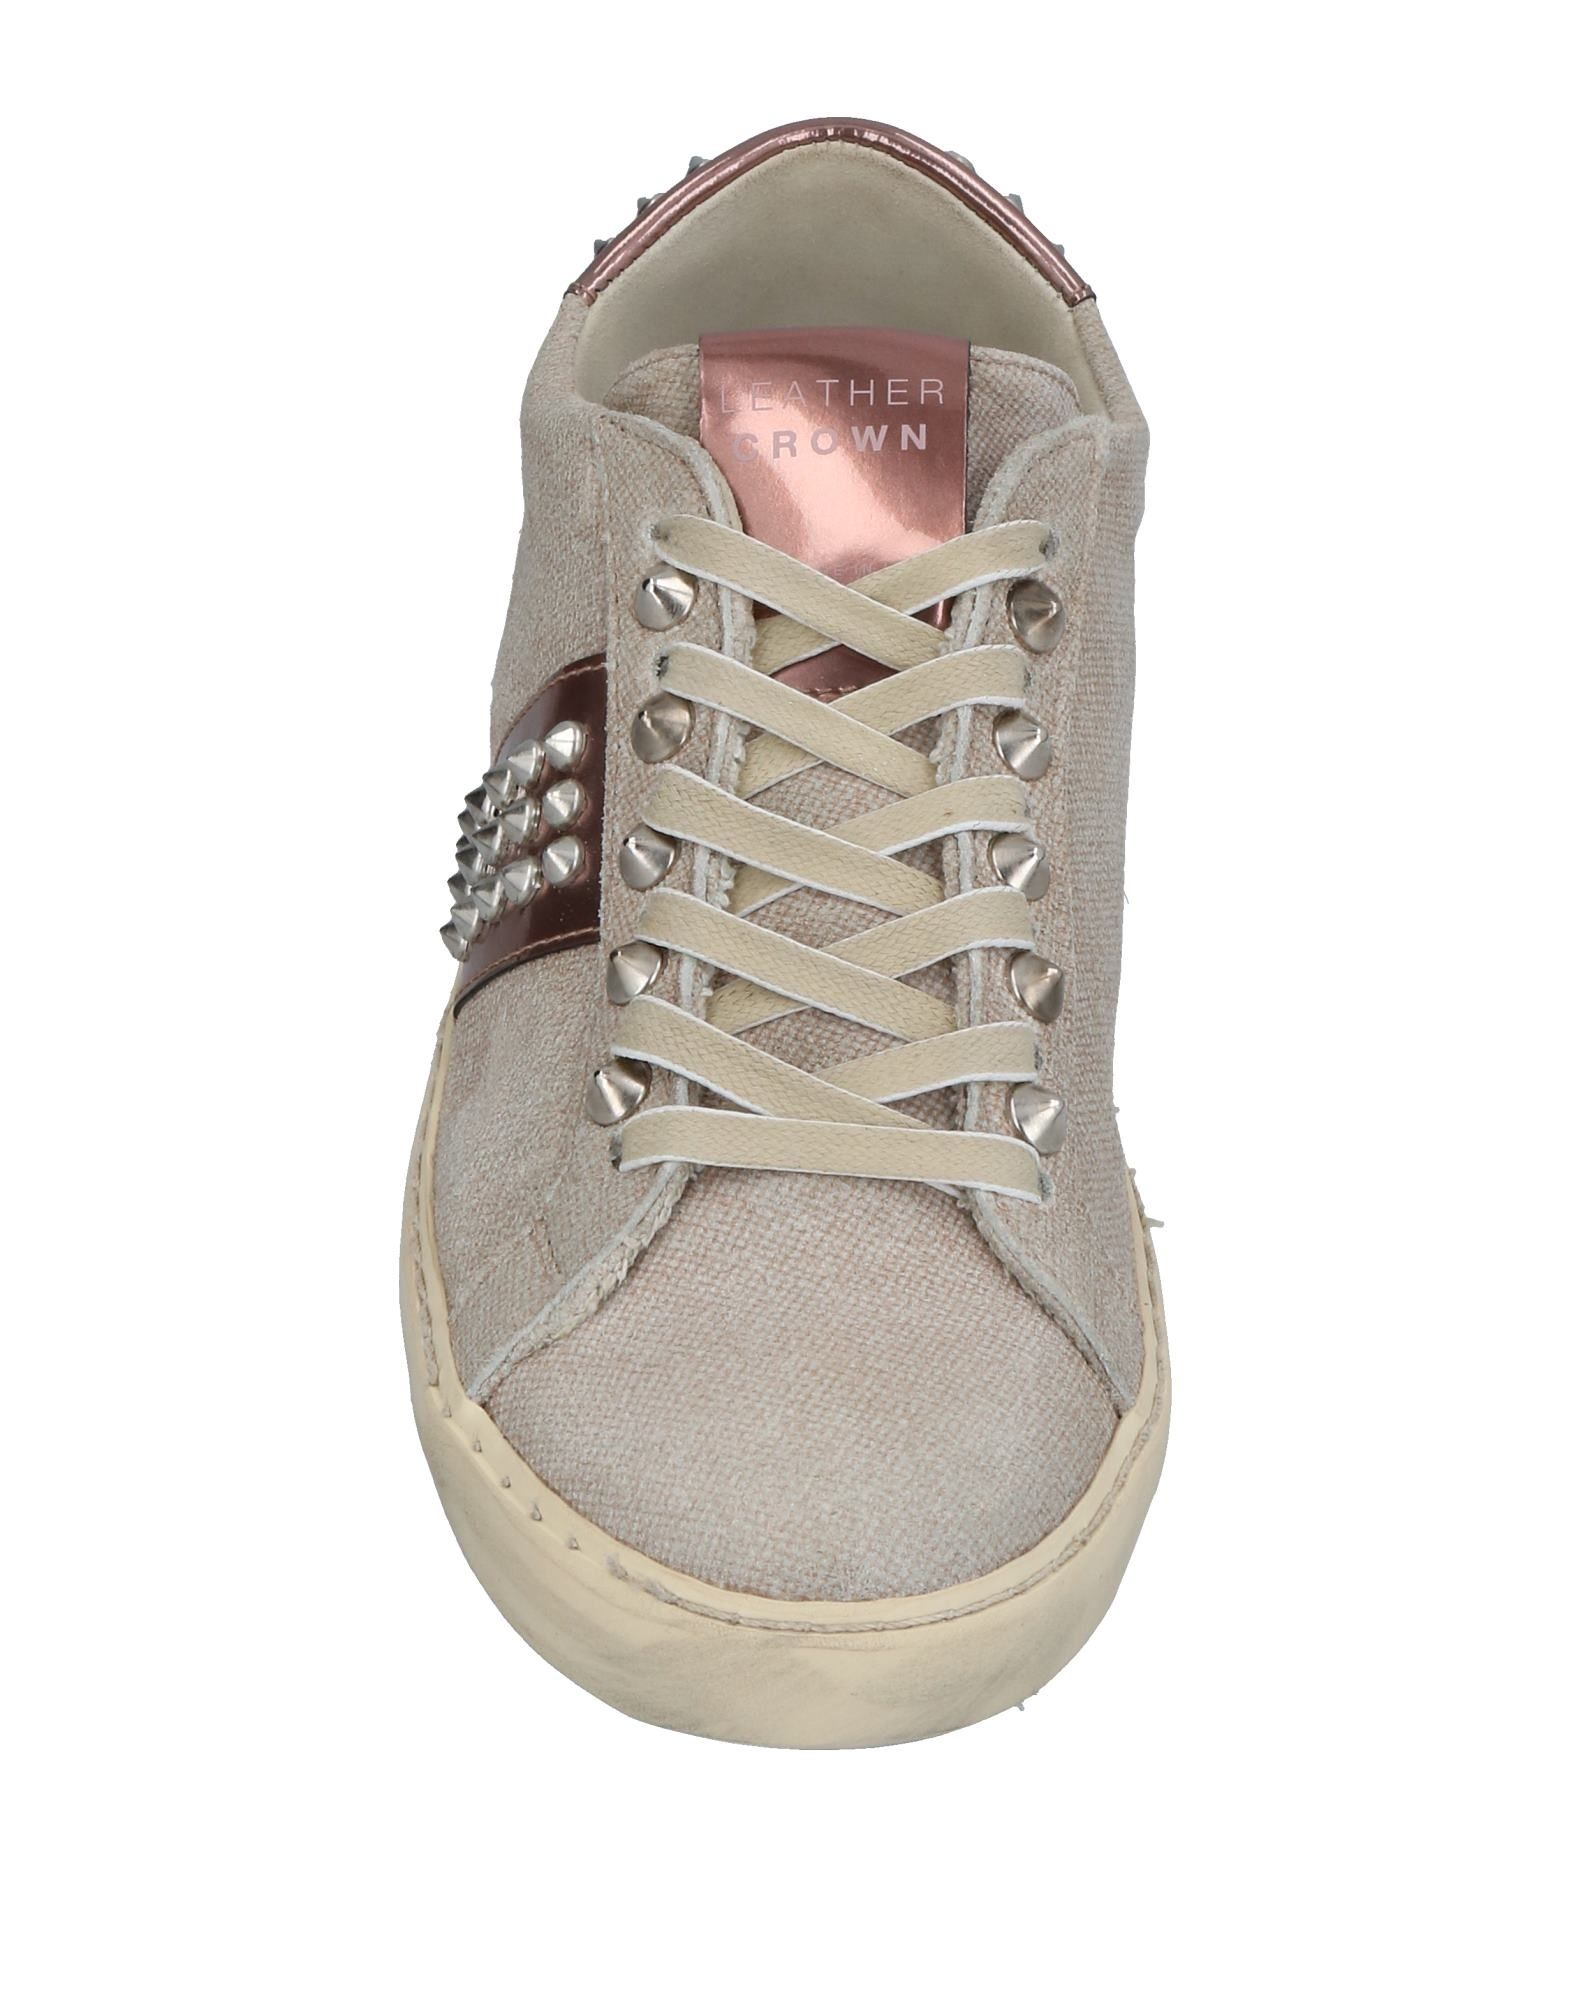 Stilvolle billige Schuhe Leather Crown Sneakers Damen Damen Damen  11384876IG 511645